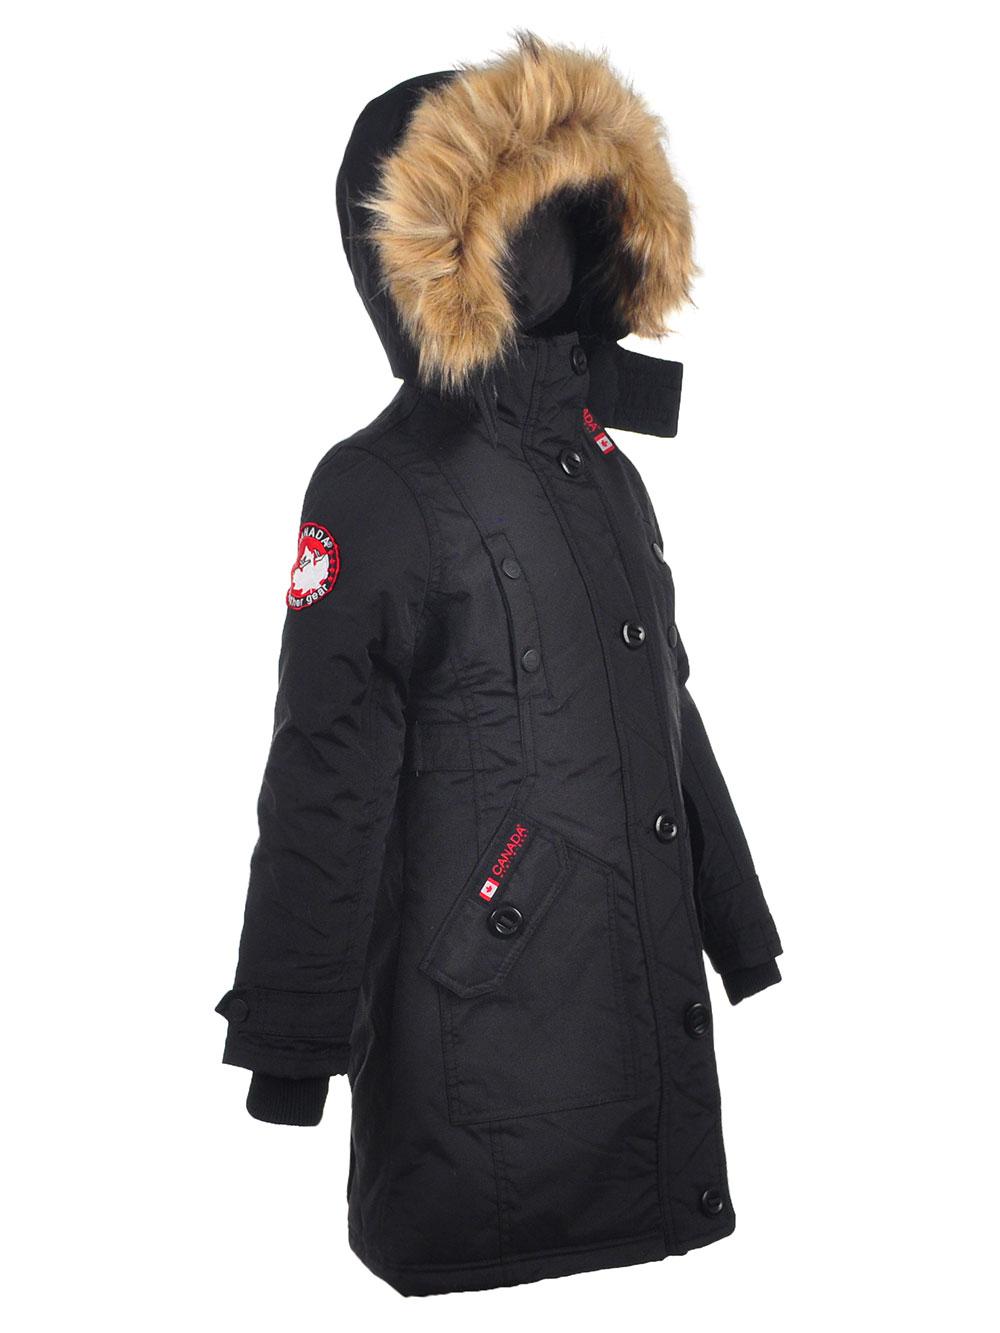 Canada Weather Gear Girls/' Insulated Parka